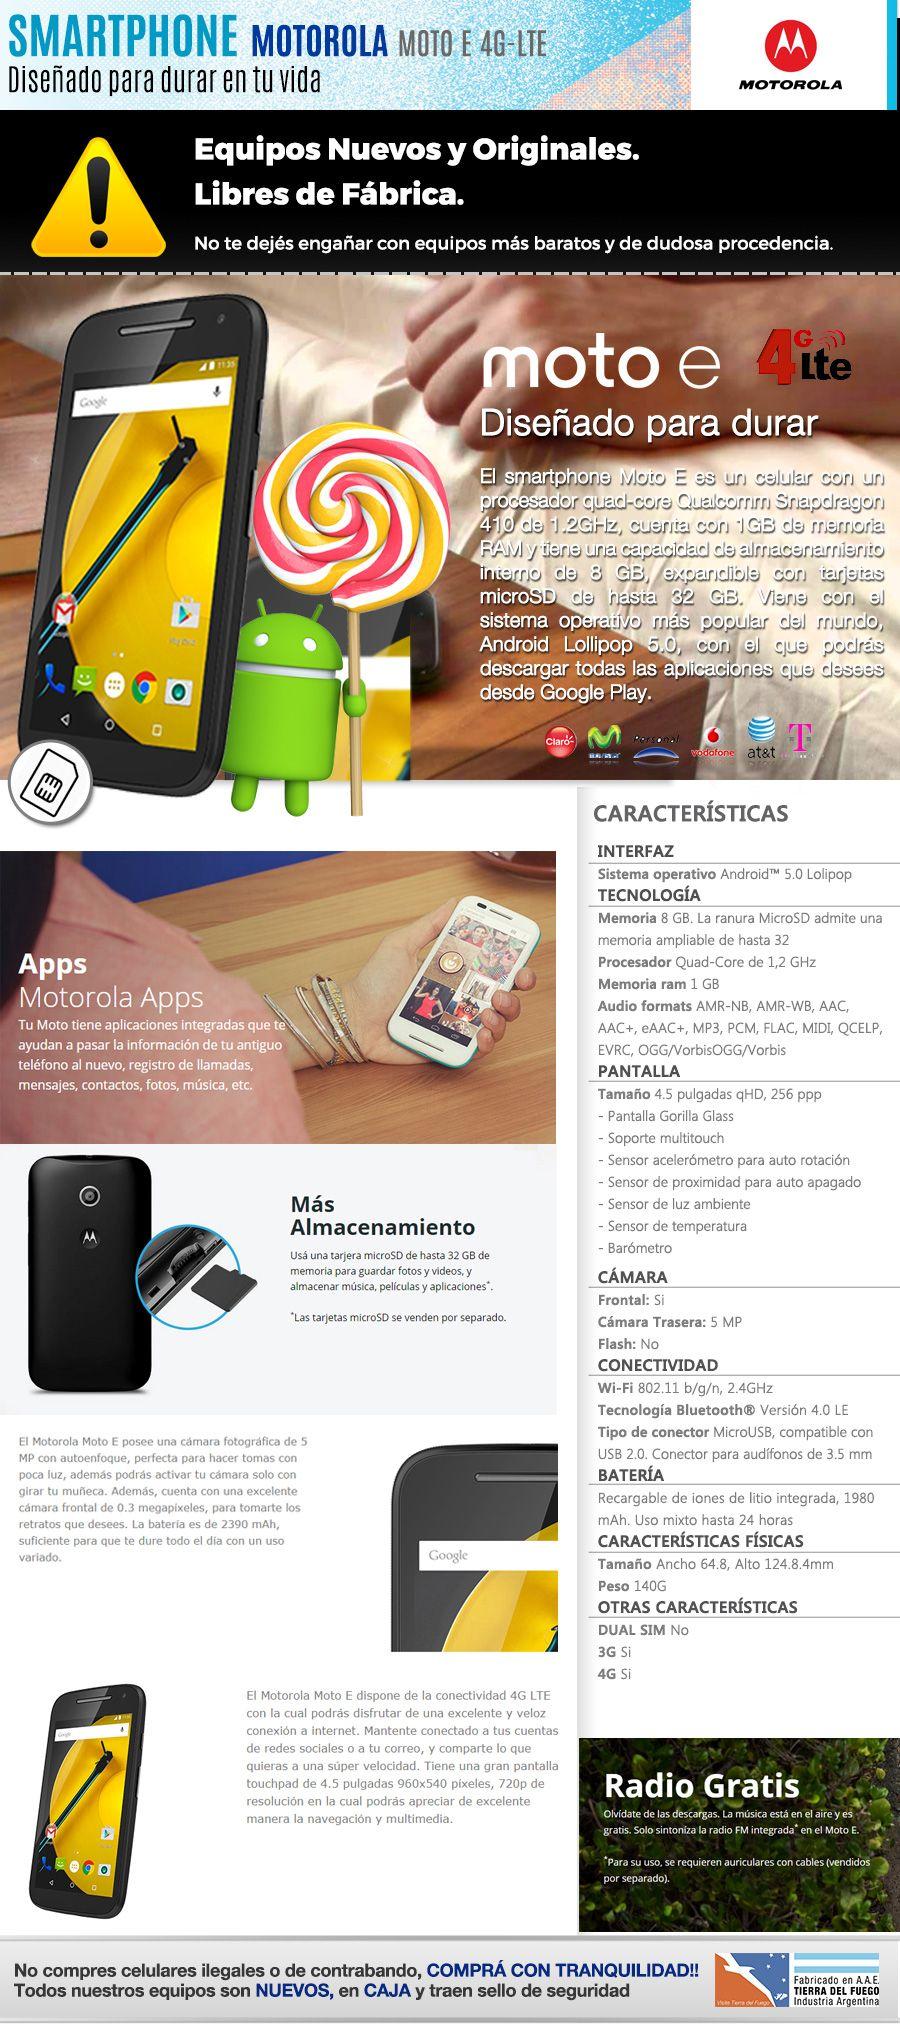 c924c8041d1 Motorola Moto E 4g Lte Libre Gps Cámara Quad-core Nuevo Gtia - $ 2.699